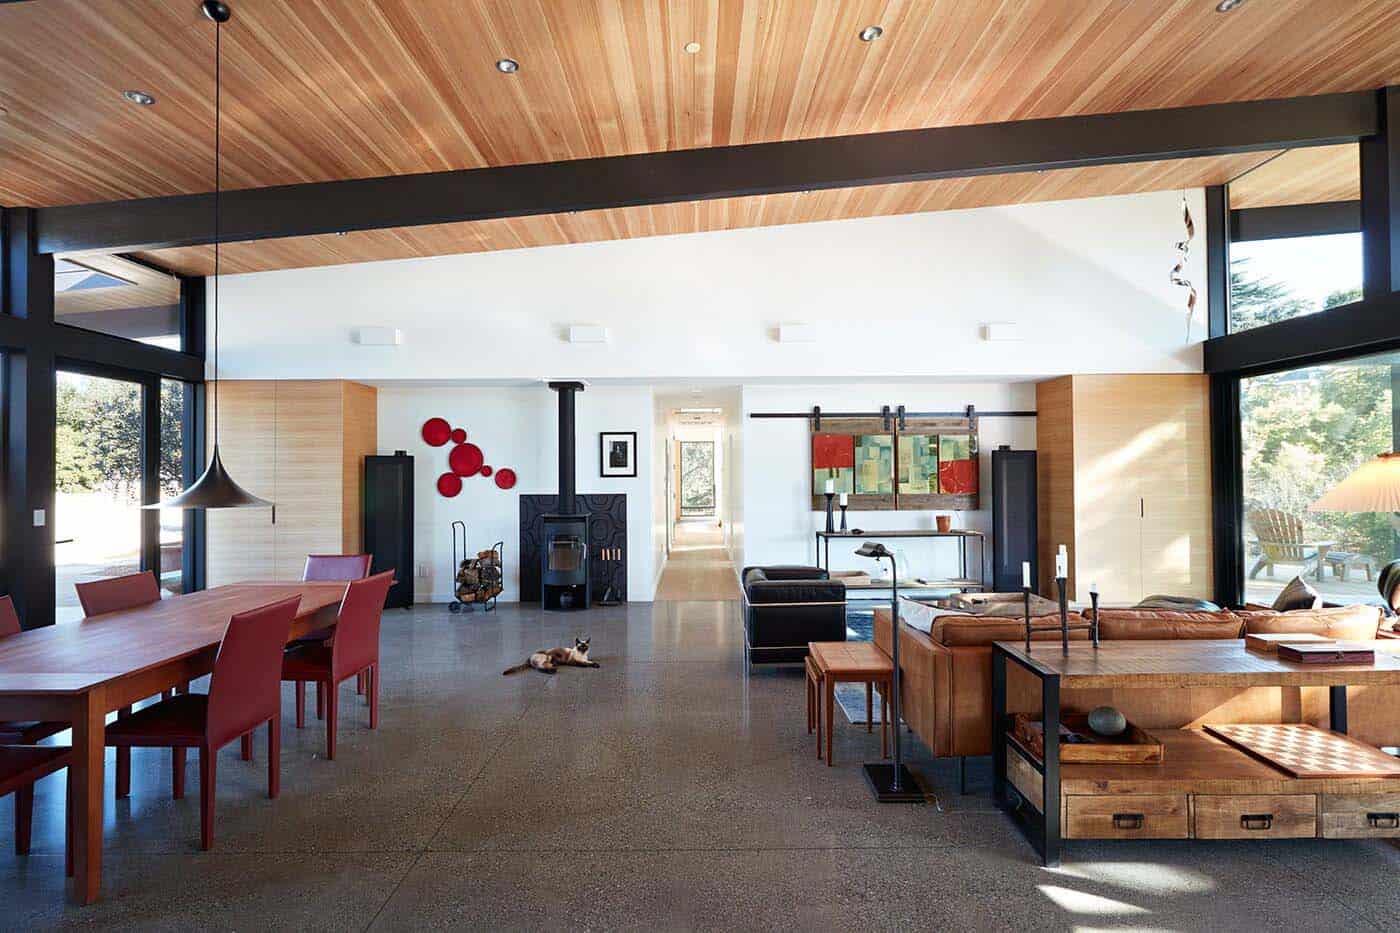 Sacramento Modern Residence-Klopf Architecture-06-1 Kindesign